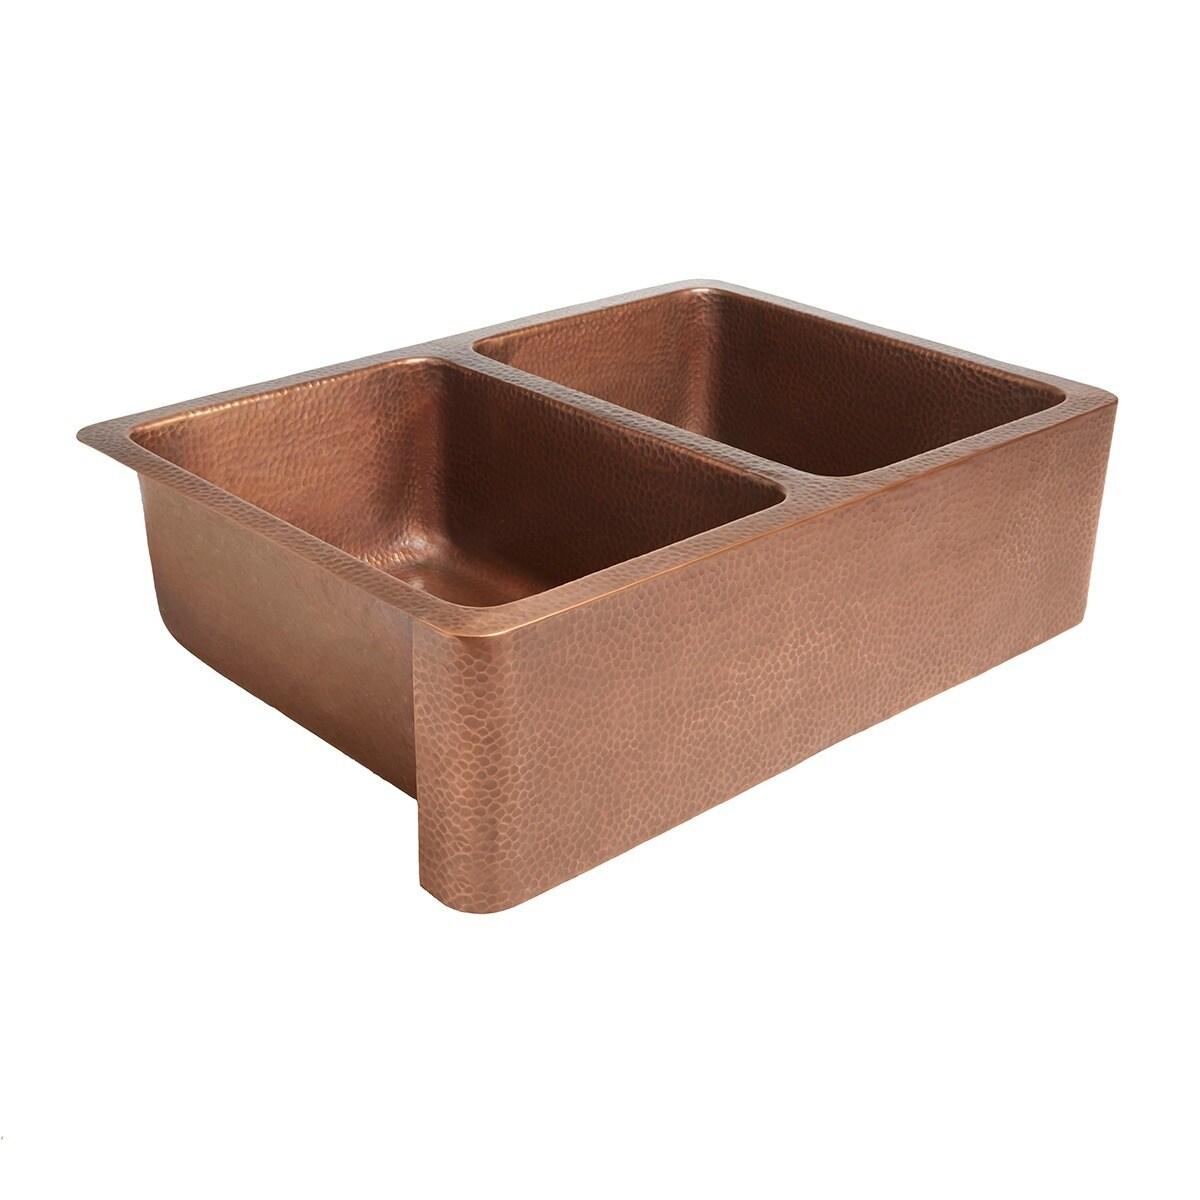 sinkology rockwell farmhouse apron front double bowl 33 copper sink